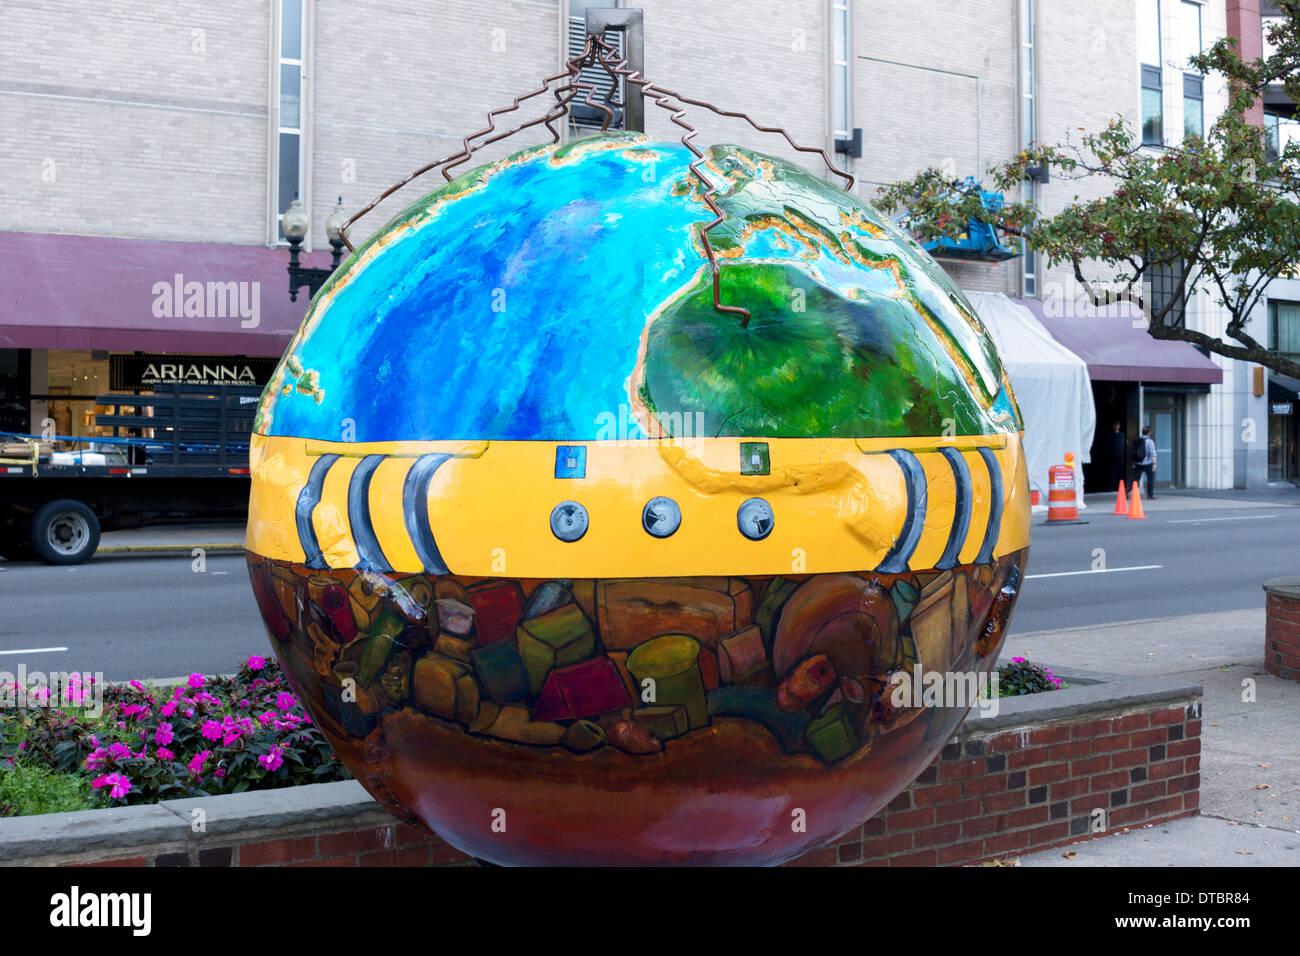 Cool Public Art